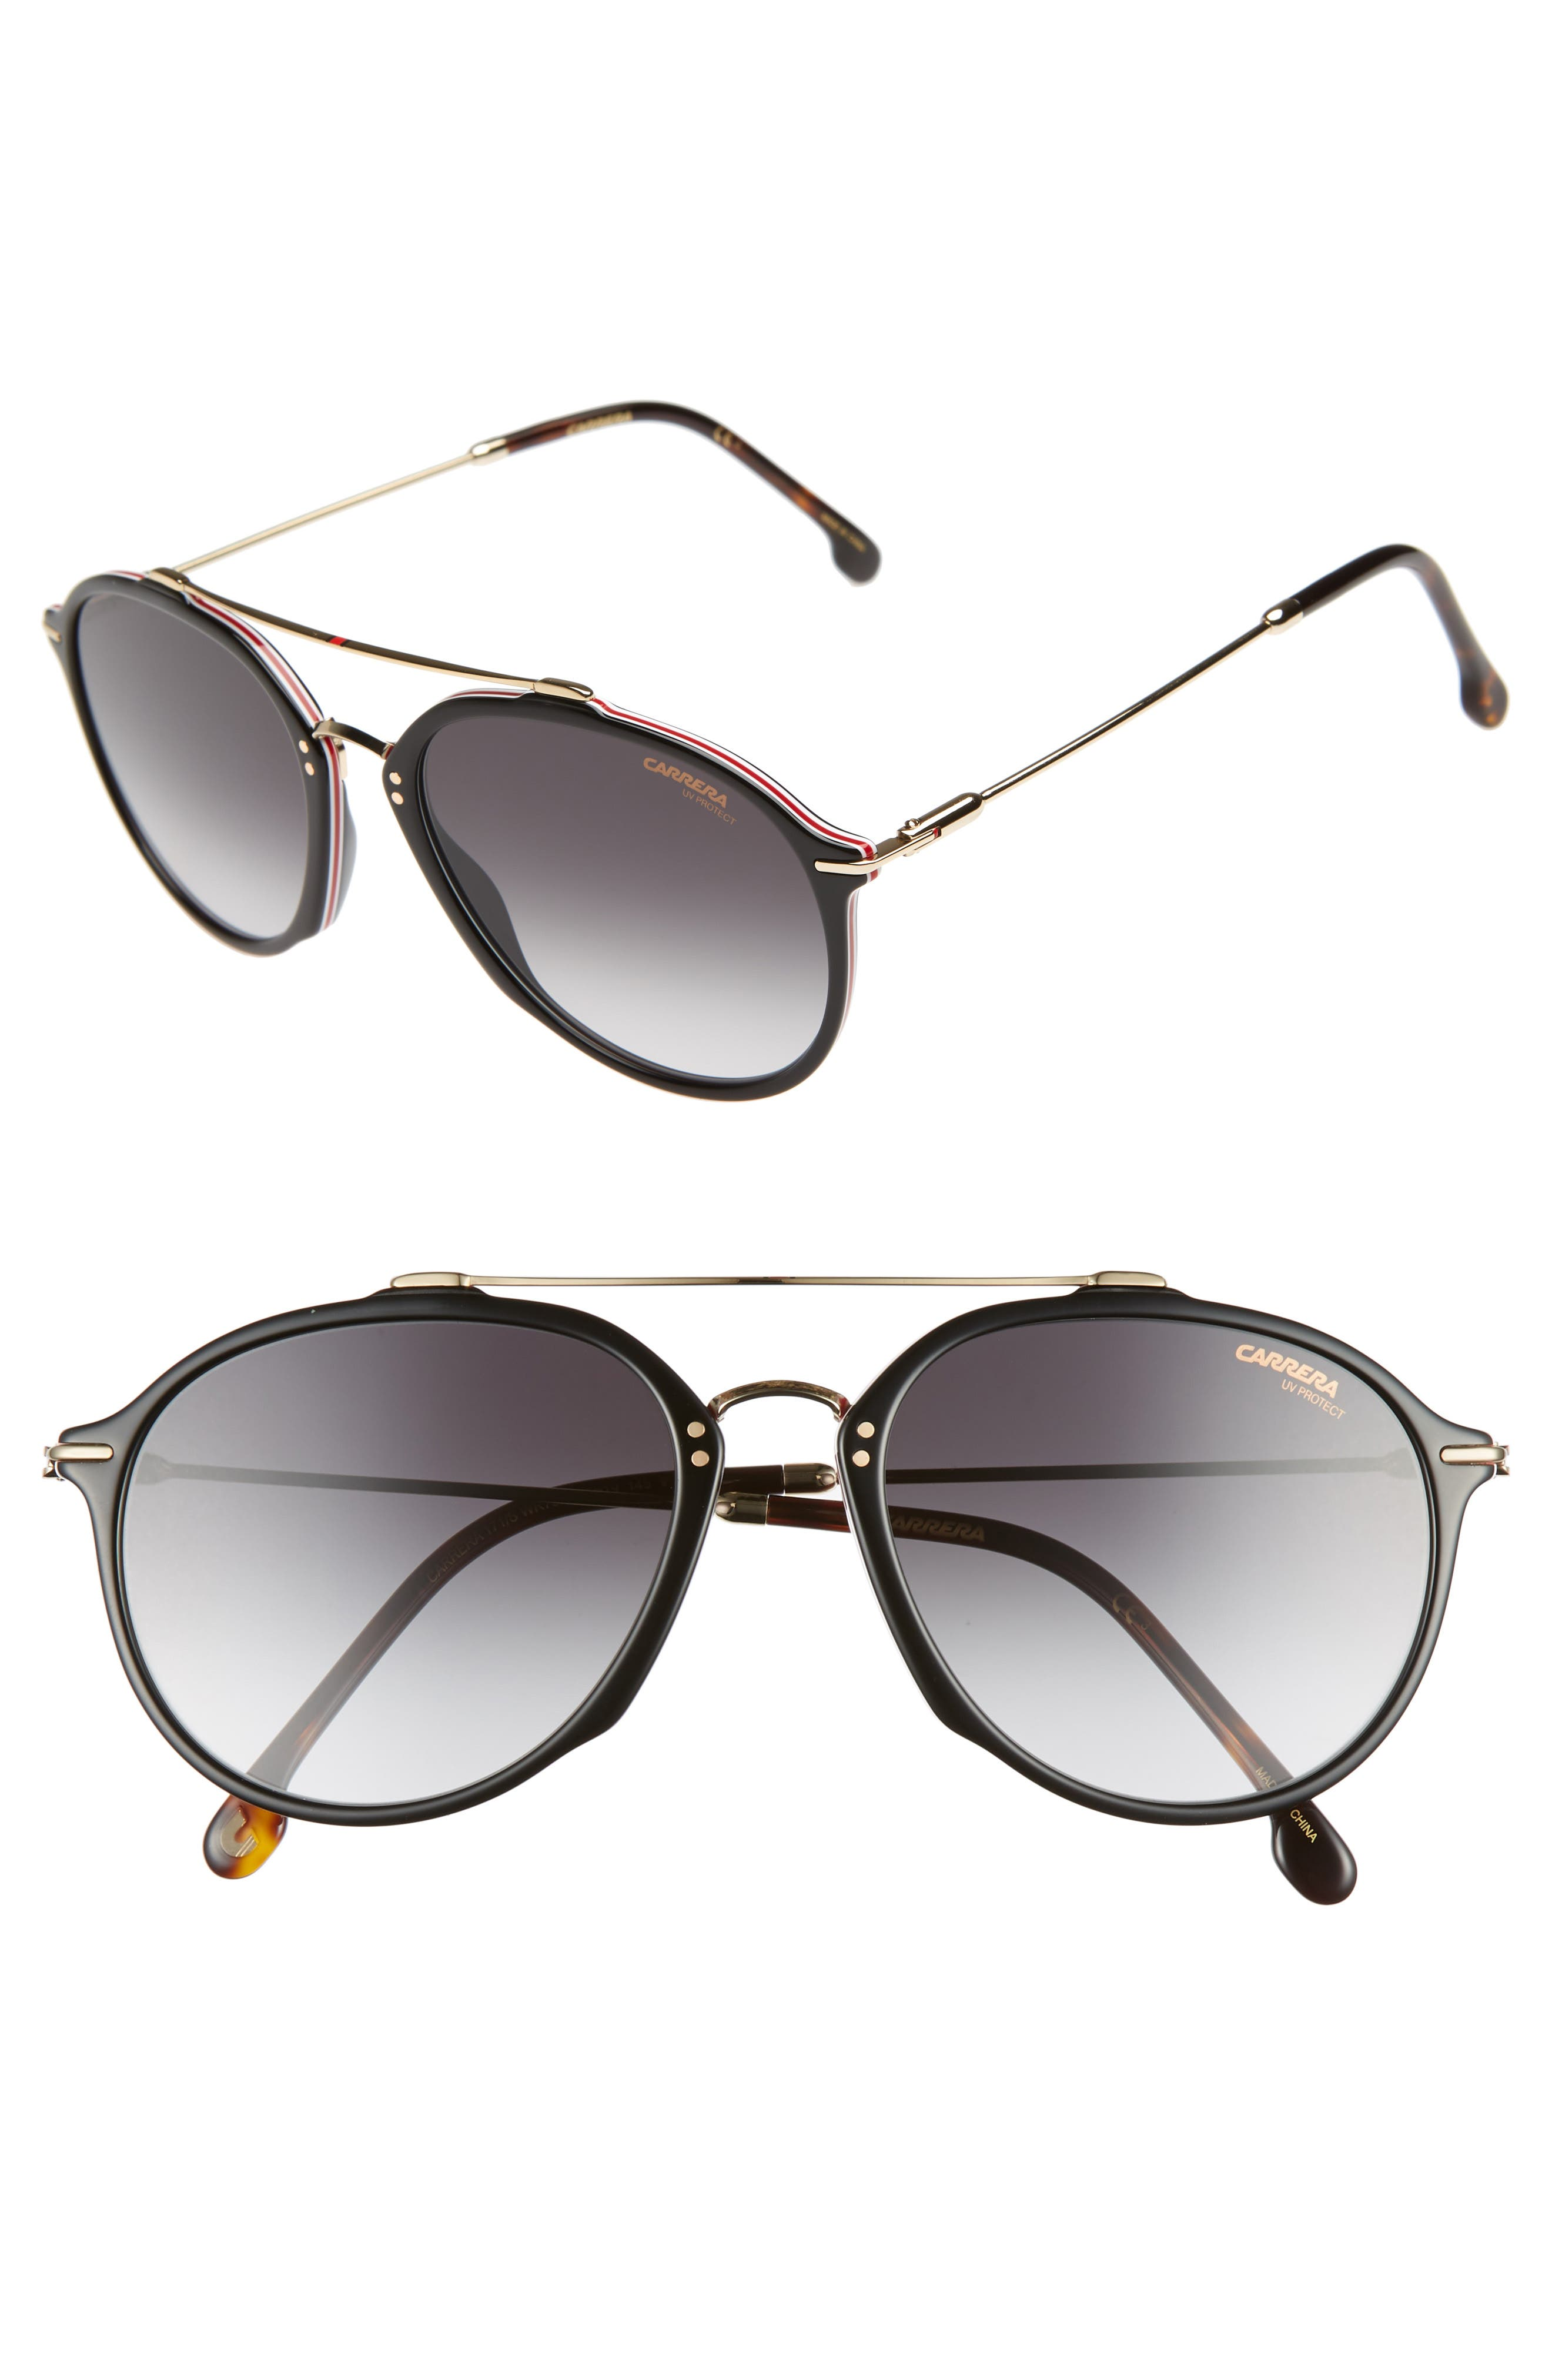 55mm Round Sunglasses,                             Main thumbnail 1, color,                             BLACK HAVANA